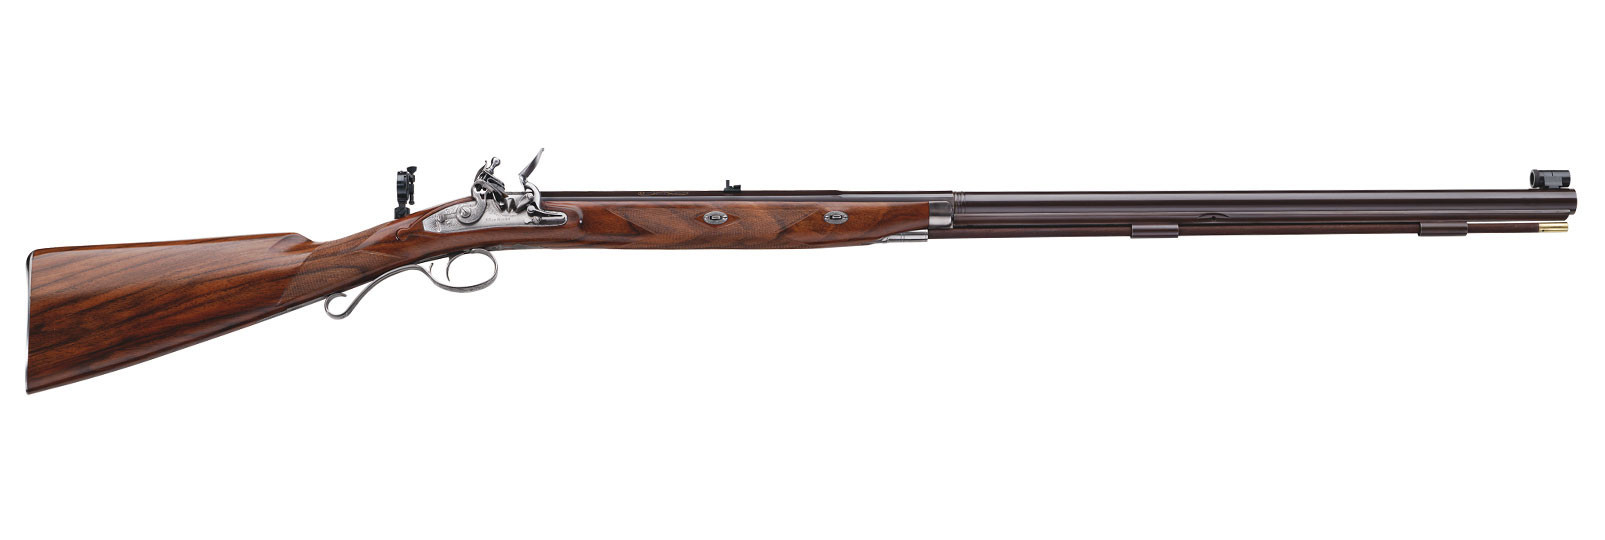 Mortimer target rifle lx .54